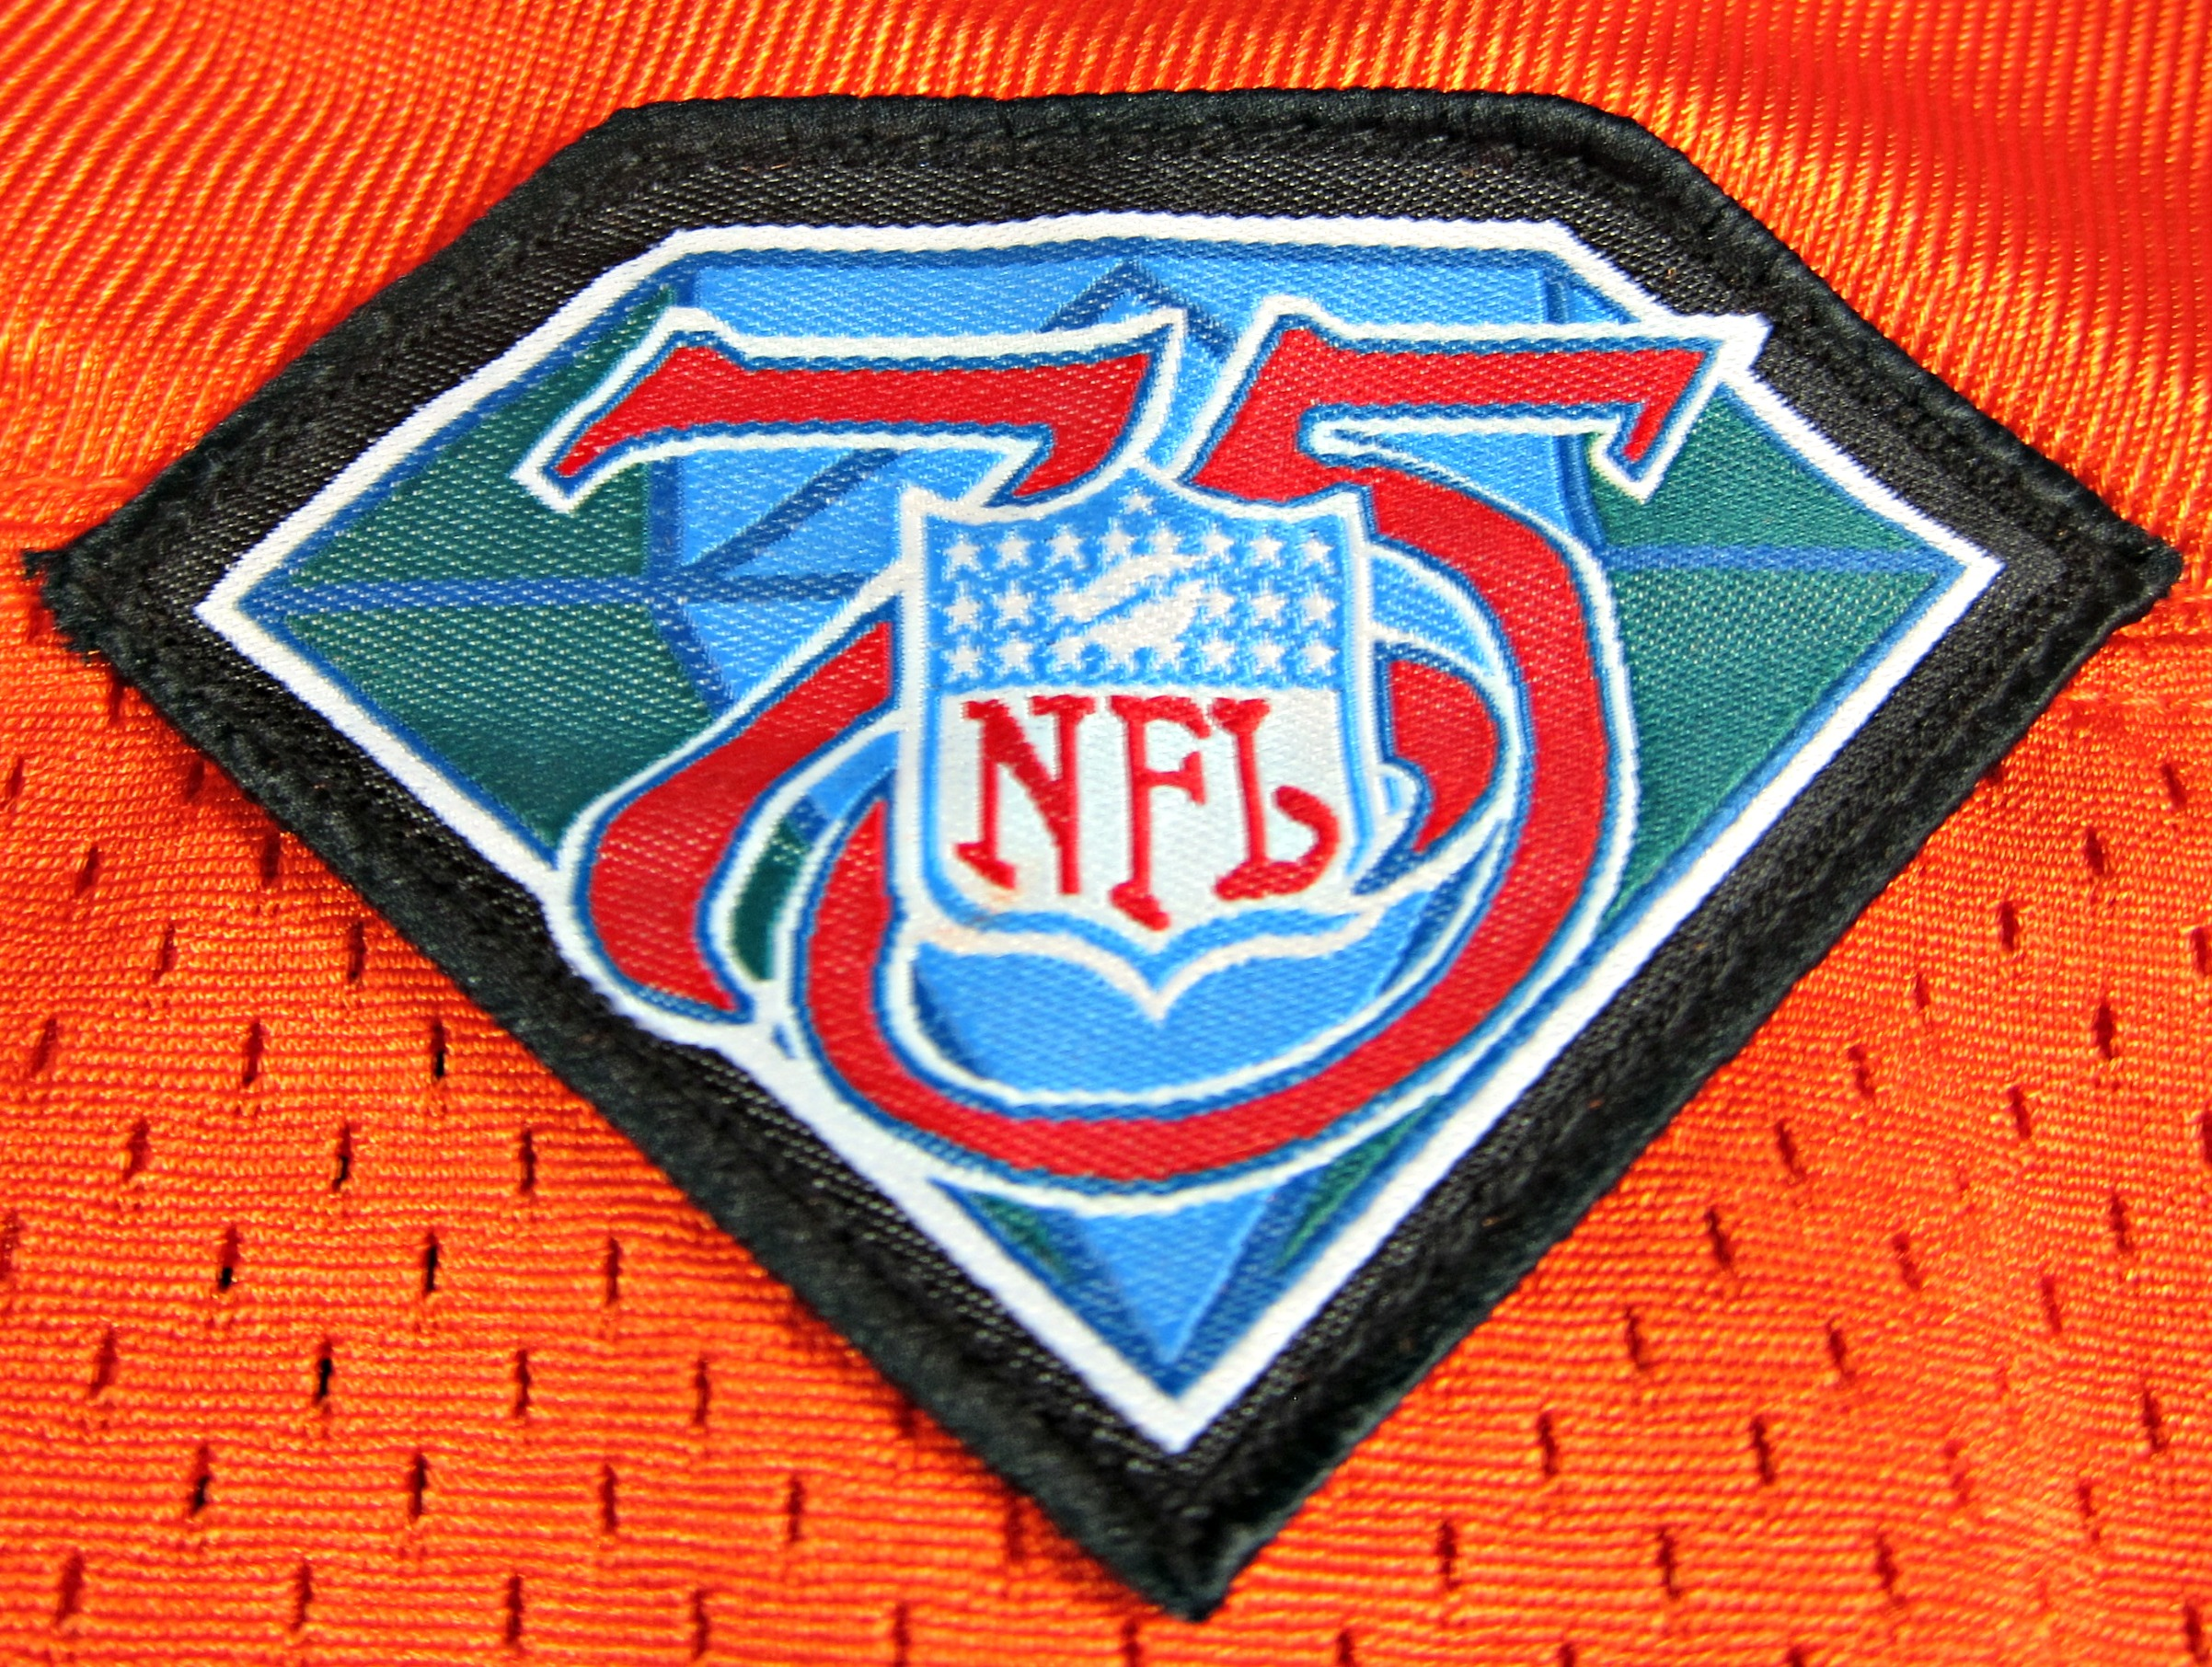 bab3e1ddf Denver Broncos Autographed John Elway Jersey - Memorabilia Center